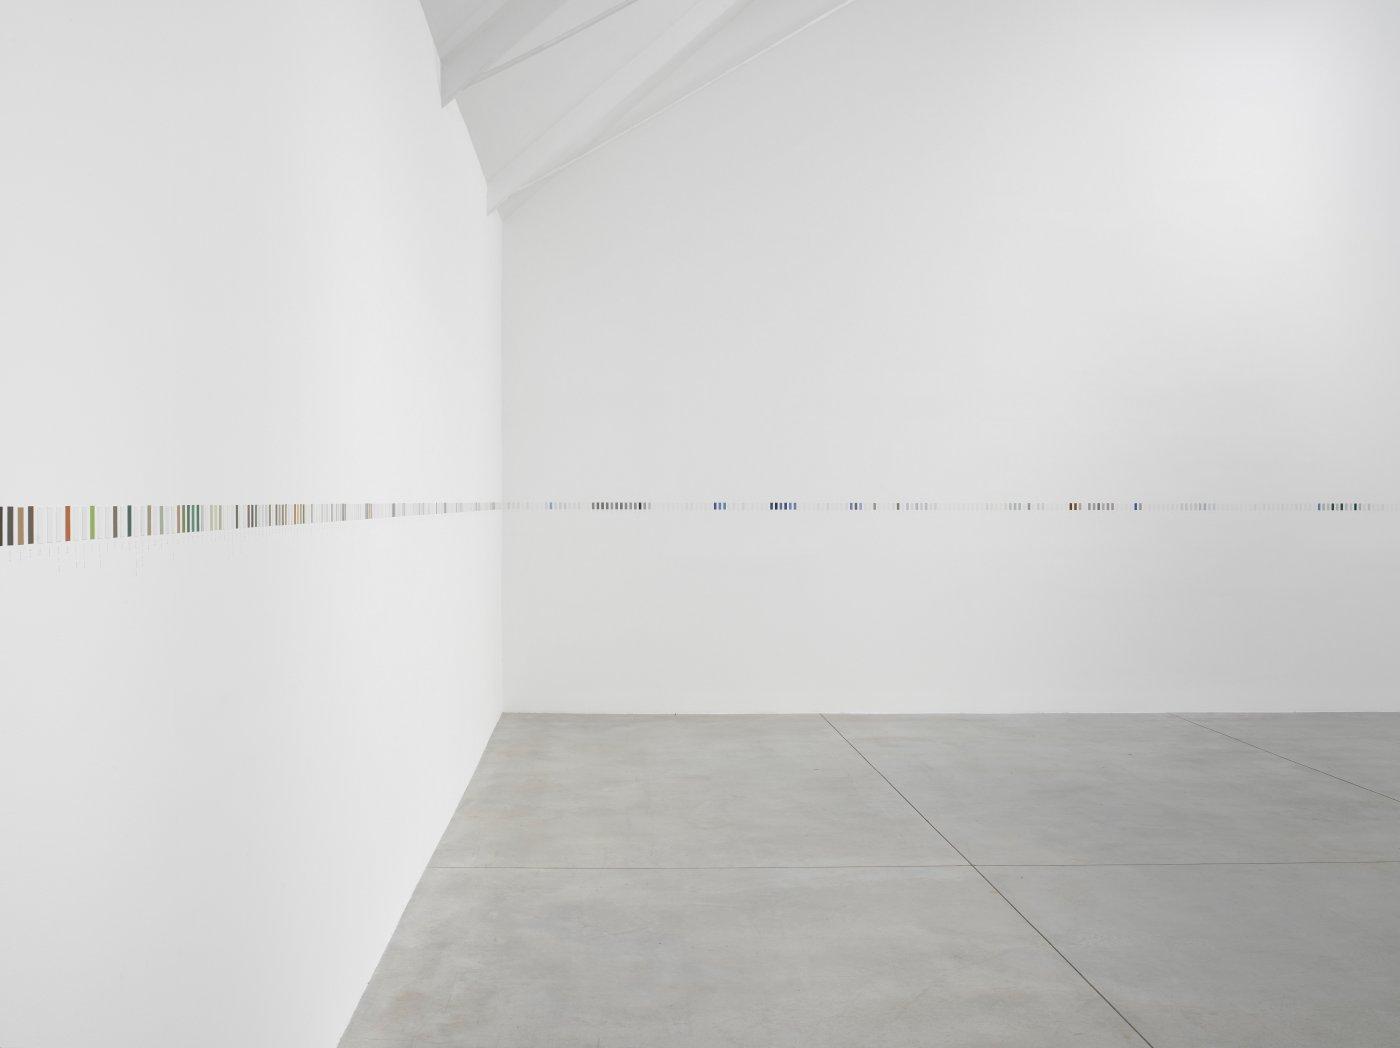 Lisson Gallery Bell Street Spencer Finch 3